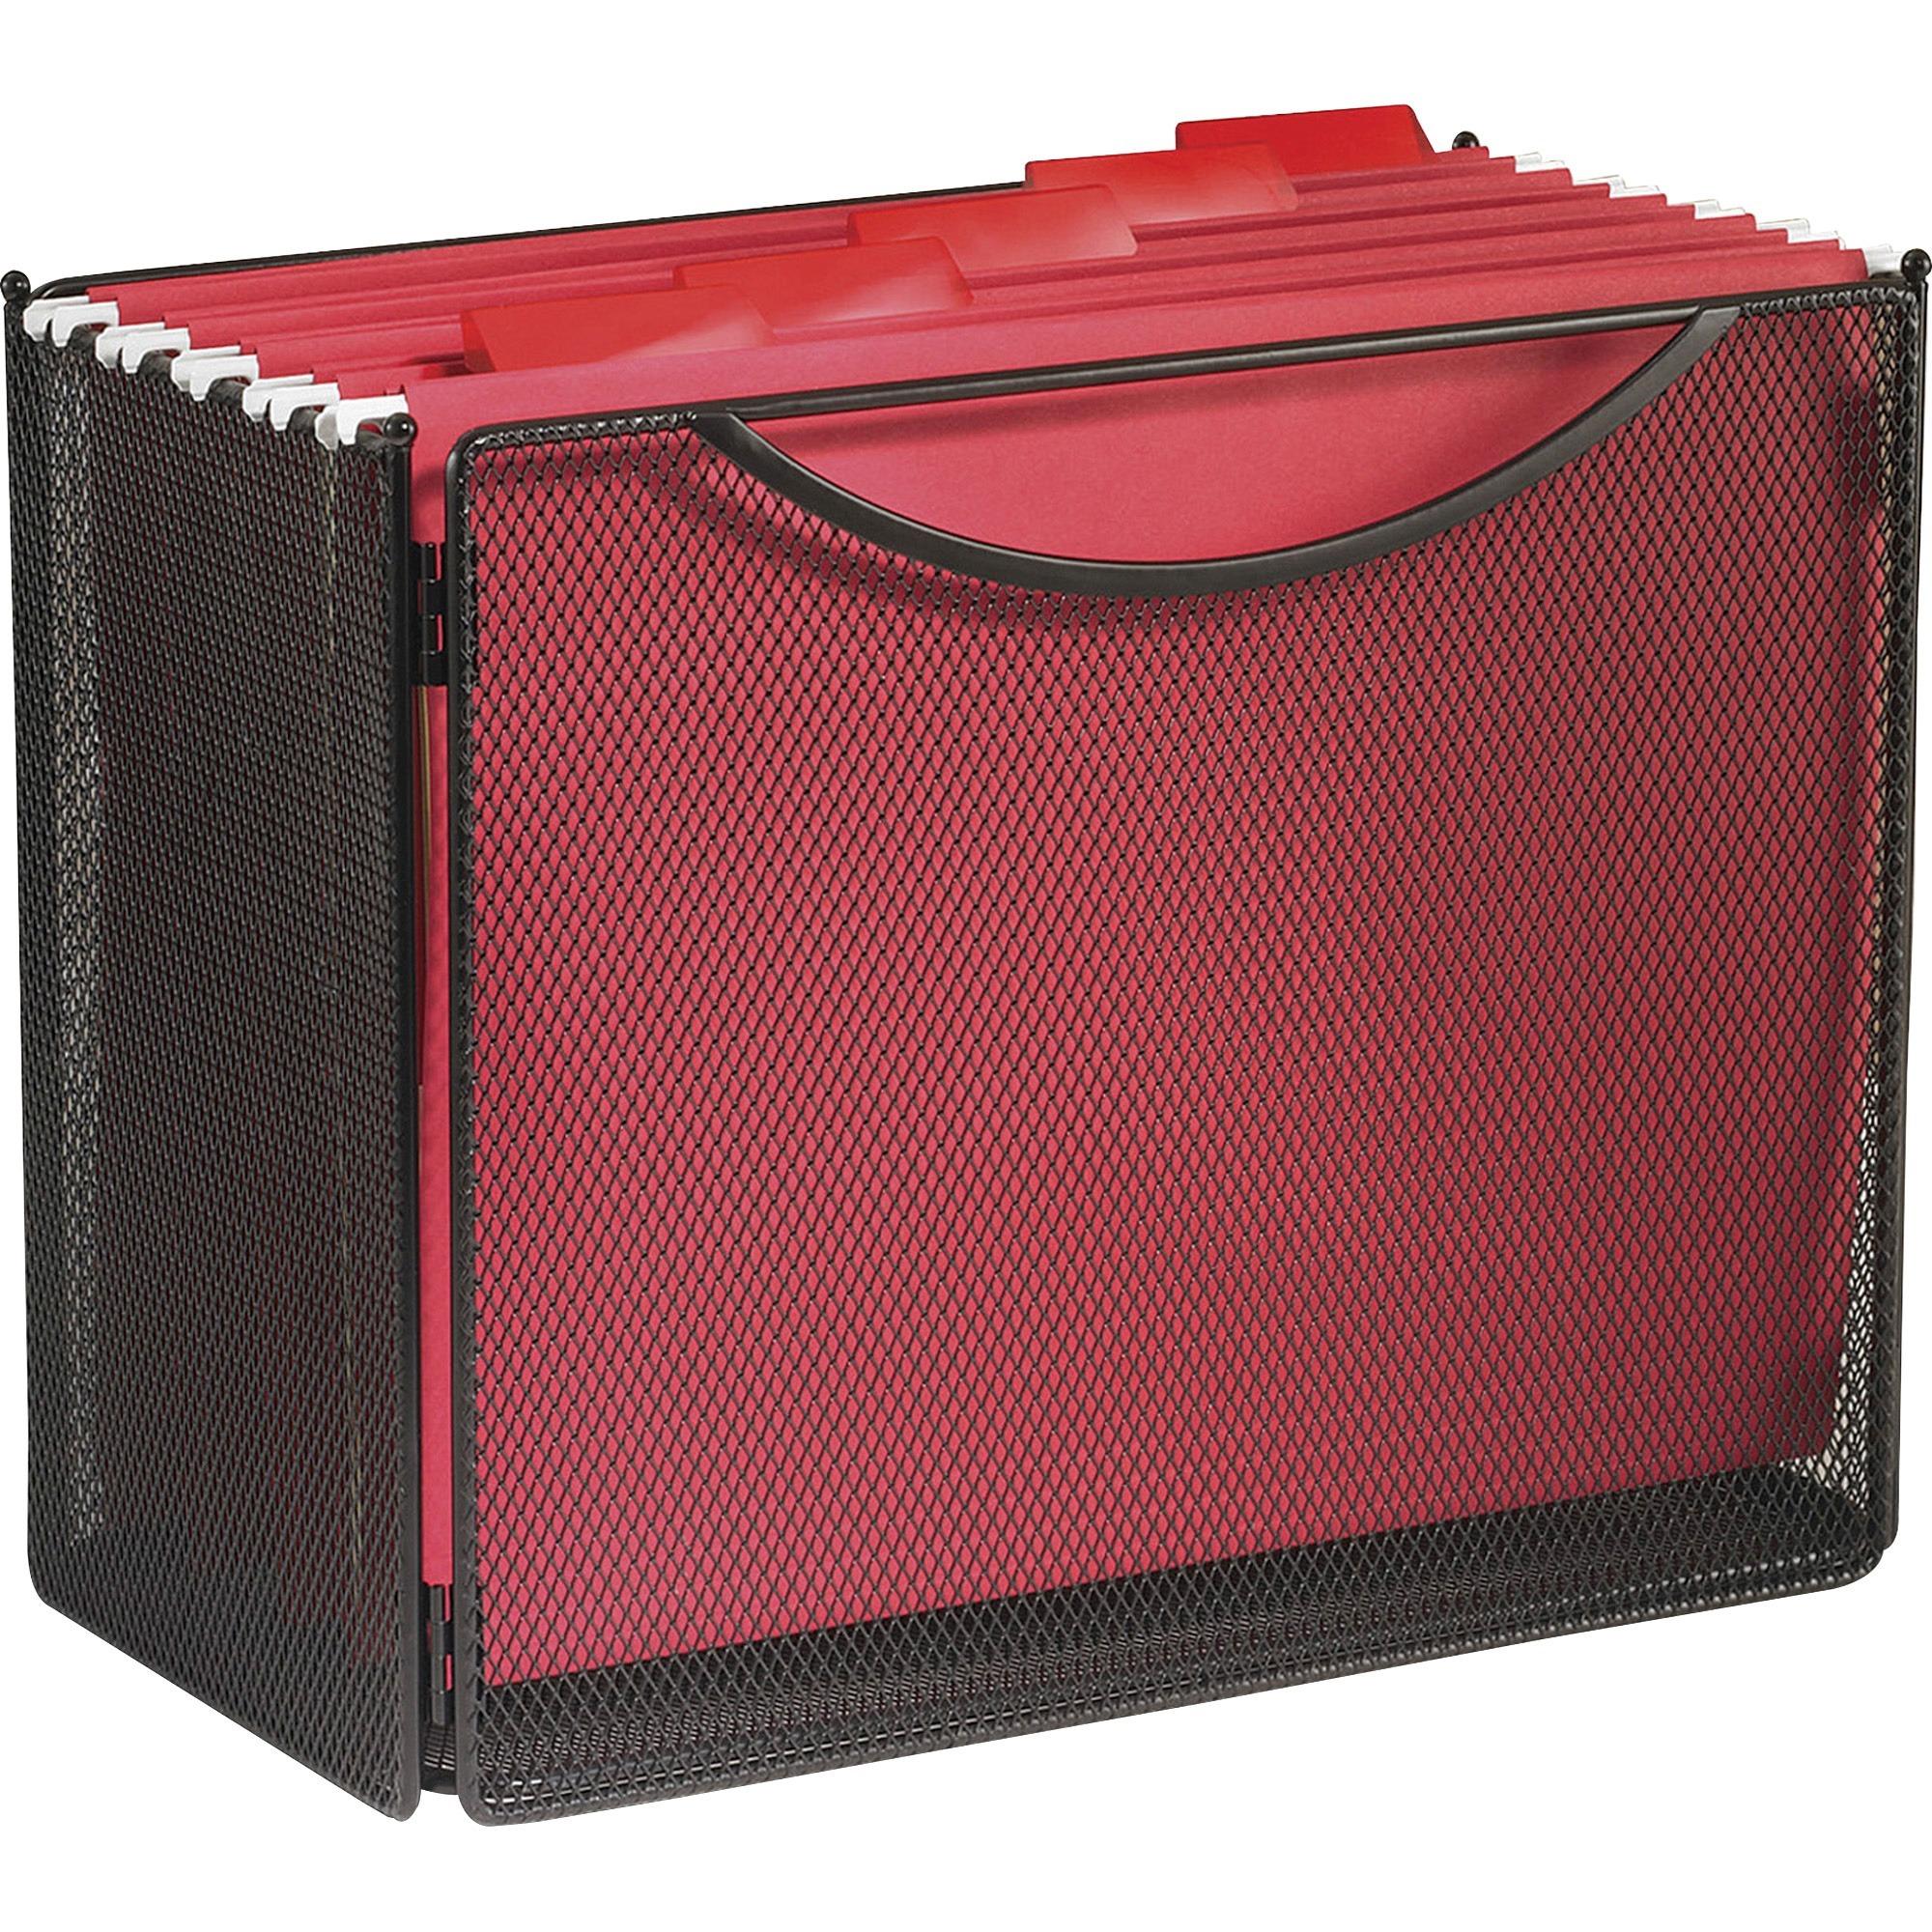 Safco Onyx Steel Mesh Desktop File Box 10 Height X 12 5 Width